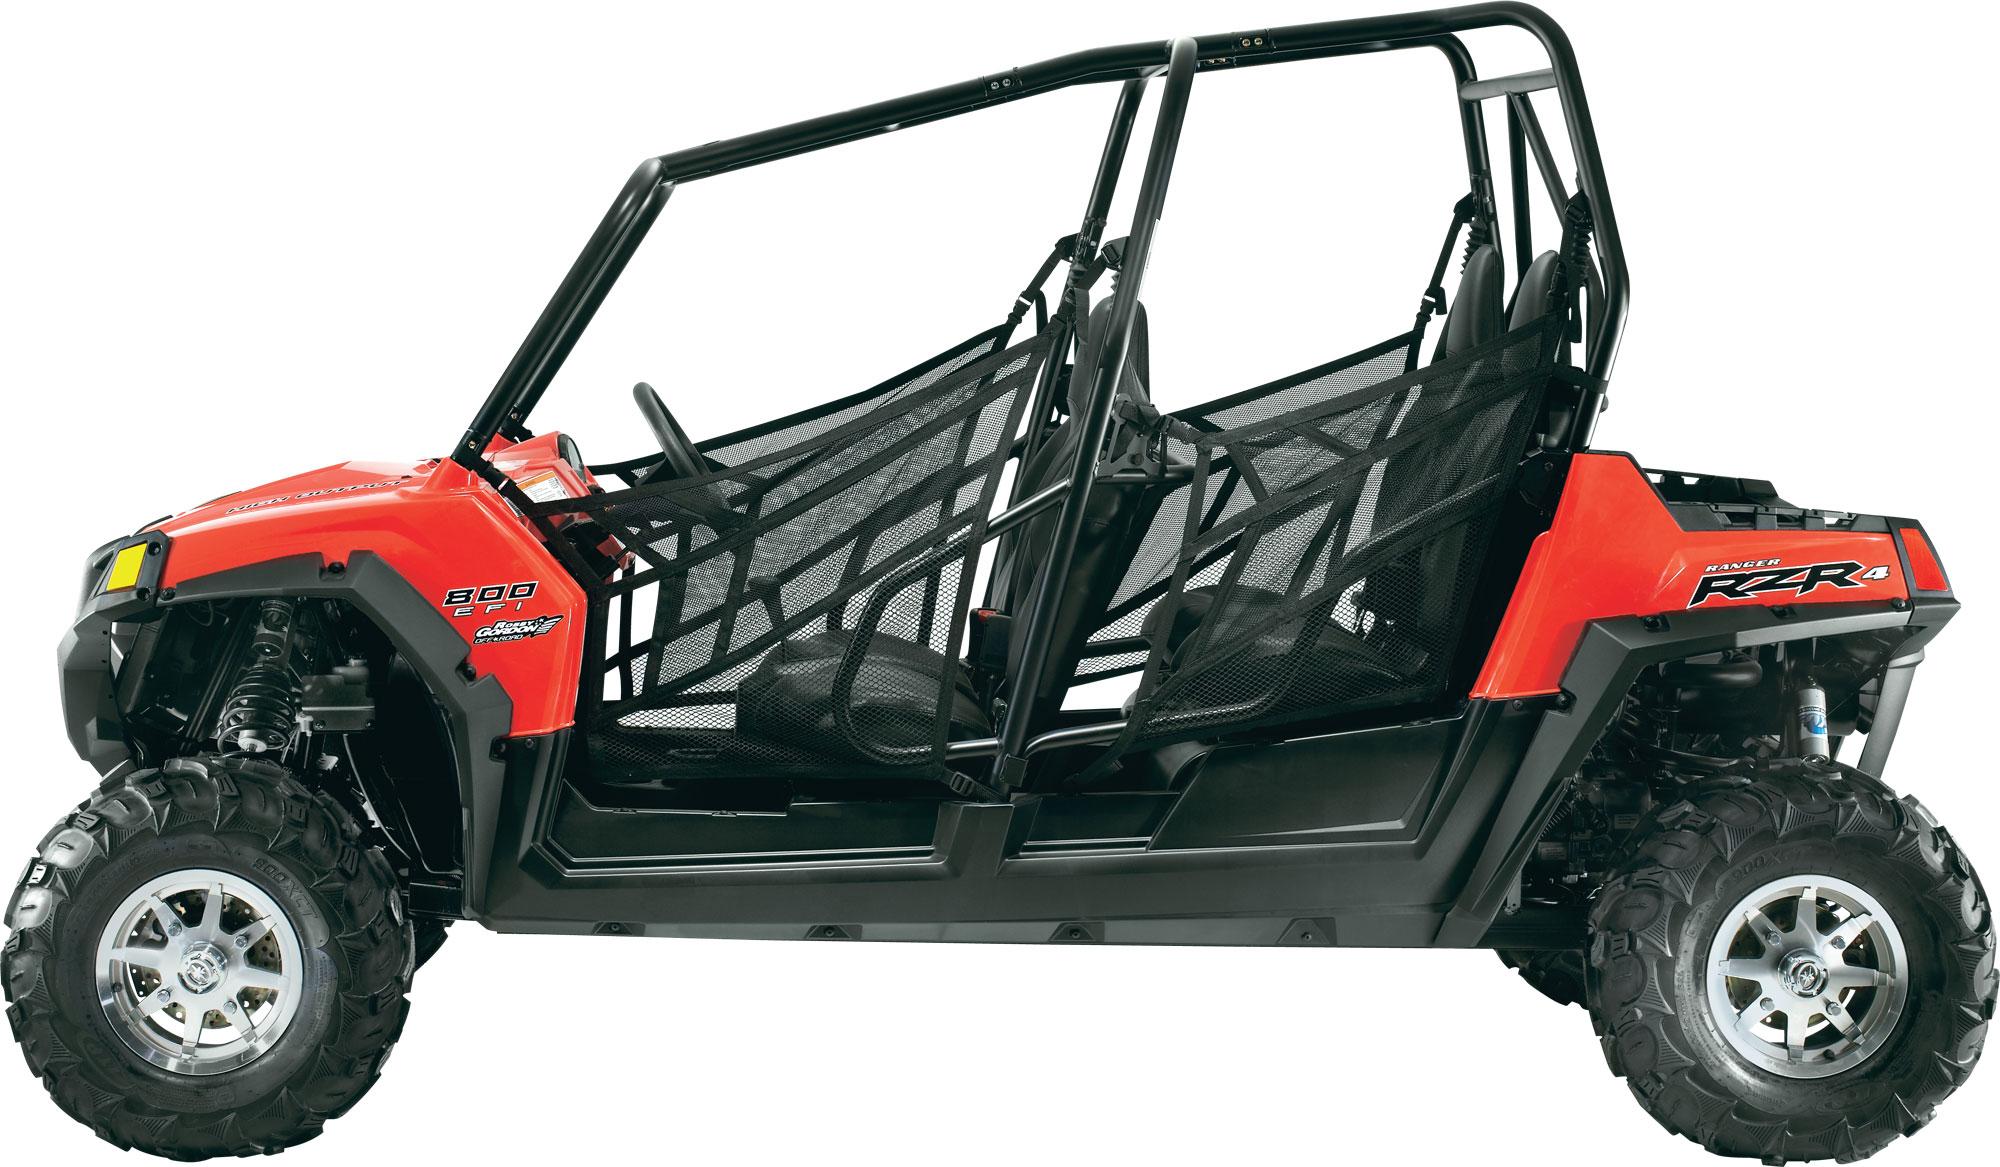 POLARIS RZR 4 800 Robby Gordon Edition specs - 2011, 2012 ...